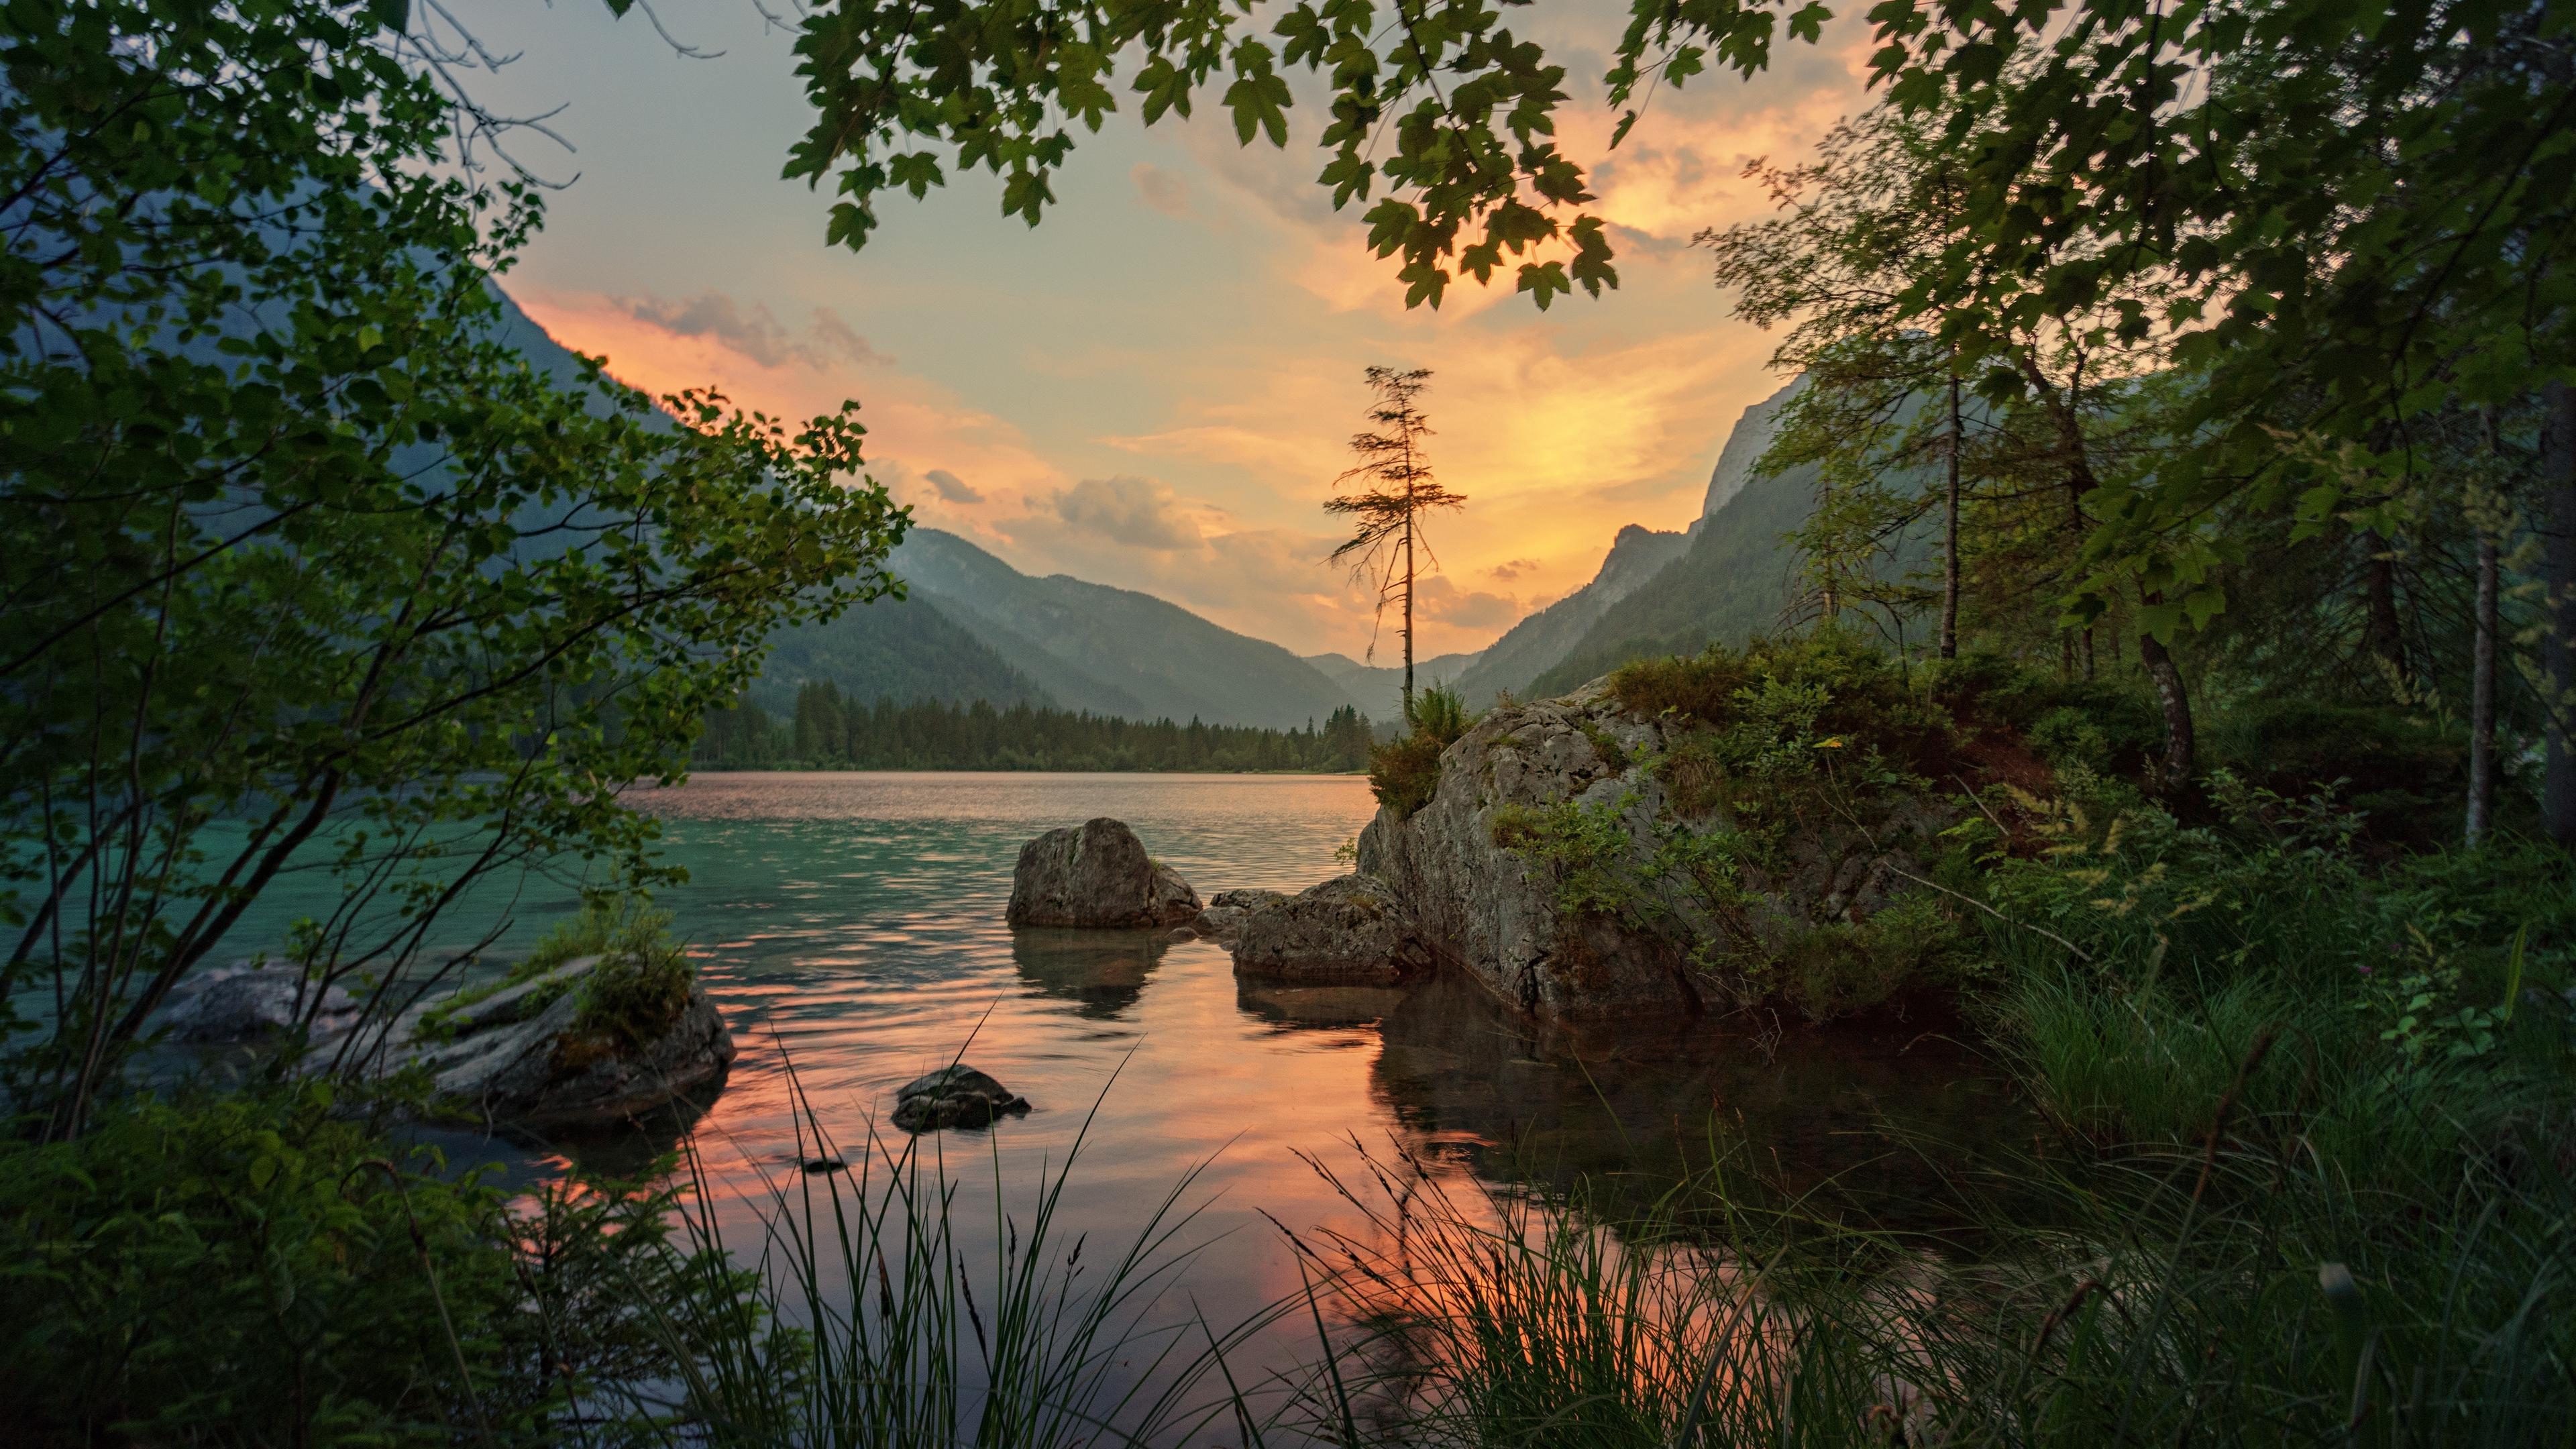 mountains river trees stones 4k 1541117491 - mountains, river, trees, stones 4k - Trees, River, Mountains